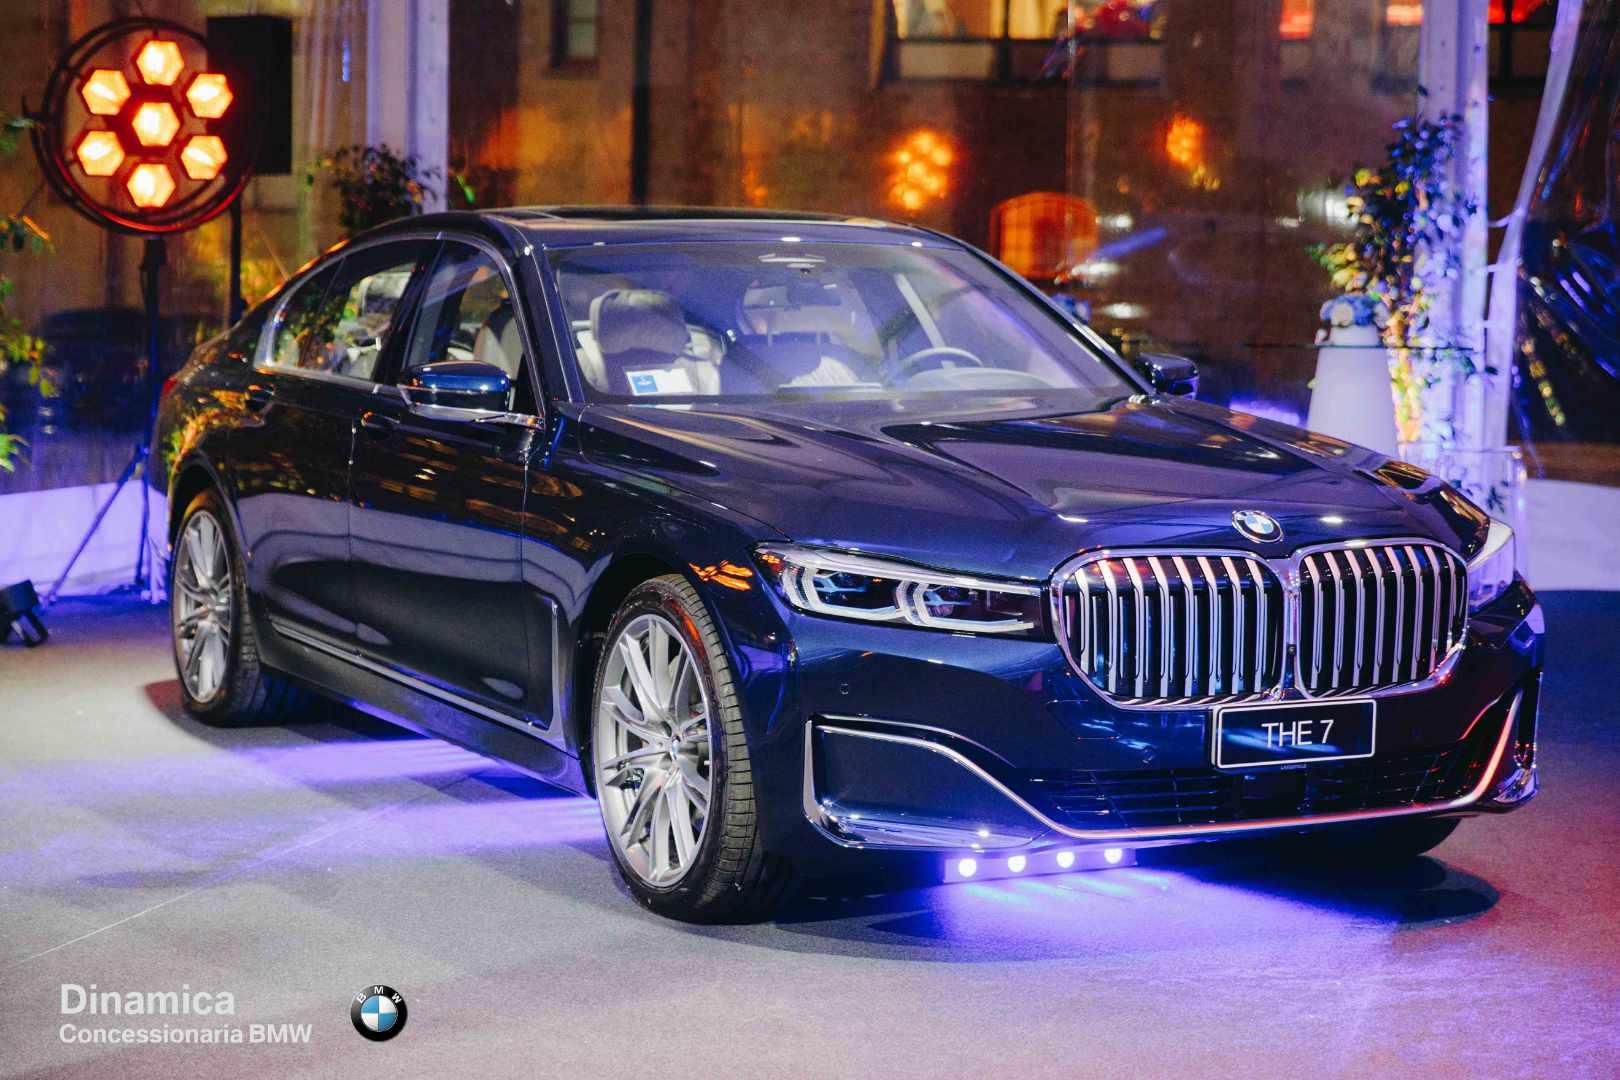 BMW Dinamica  - THE 7-156.jpg